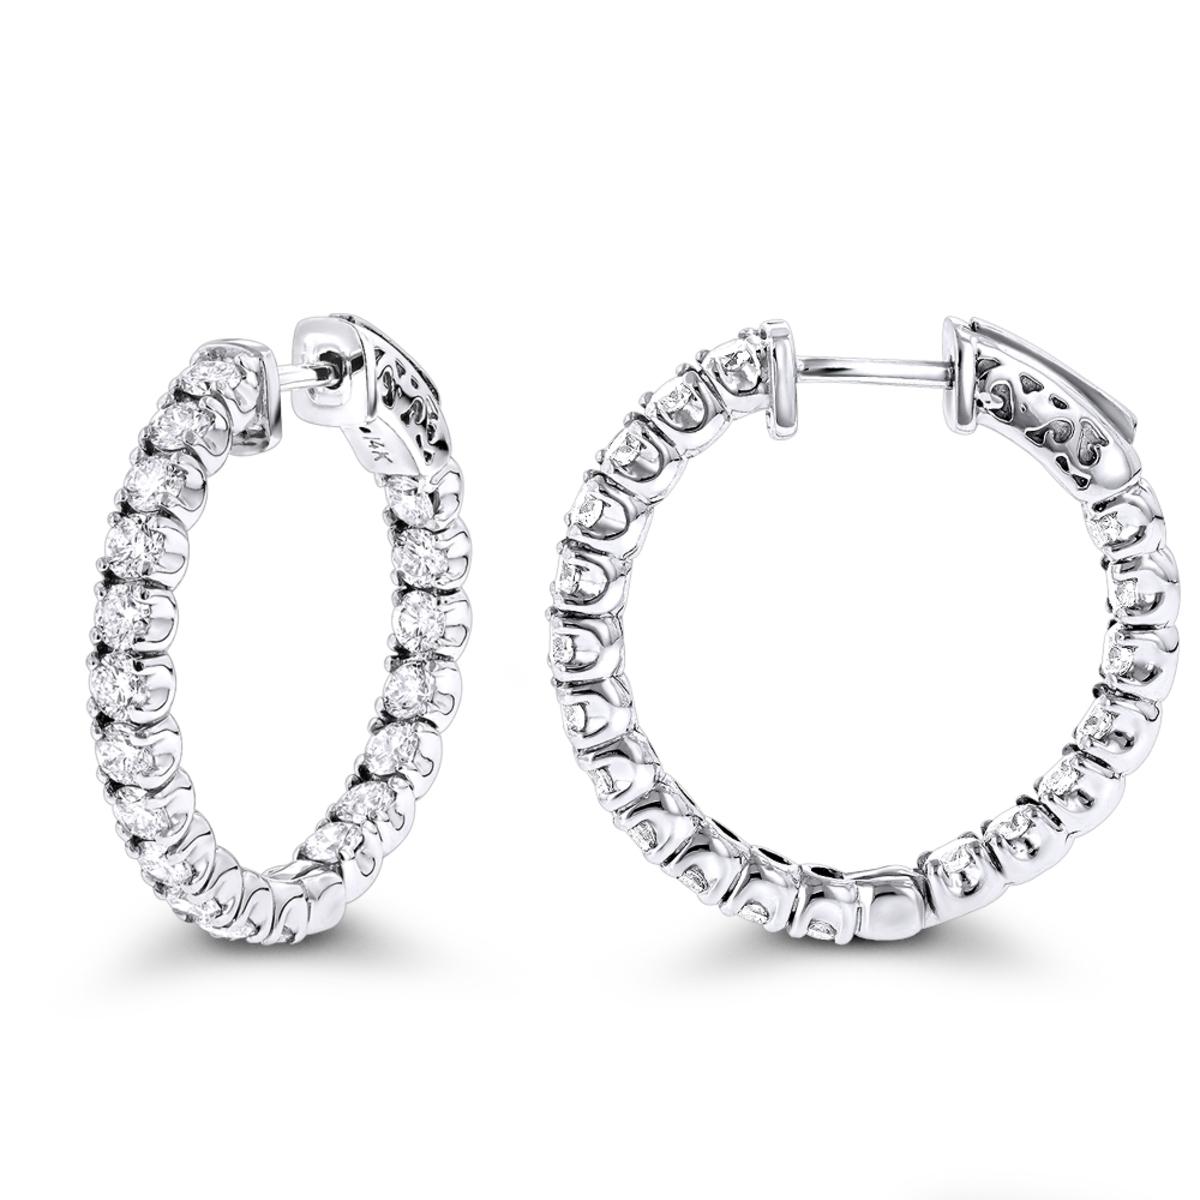 Inside Out Classic Diamond Hoop Earrings 2.75ct 14K Gold